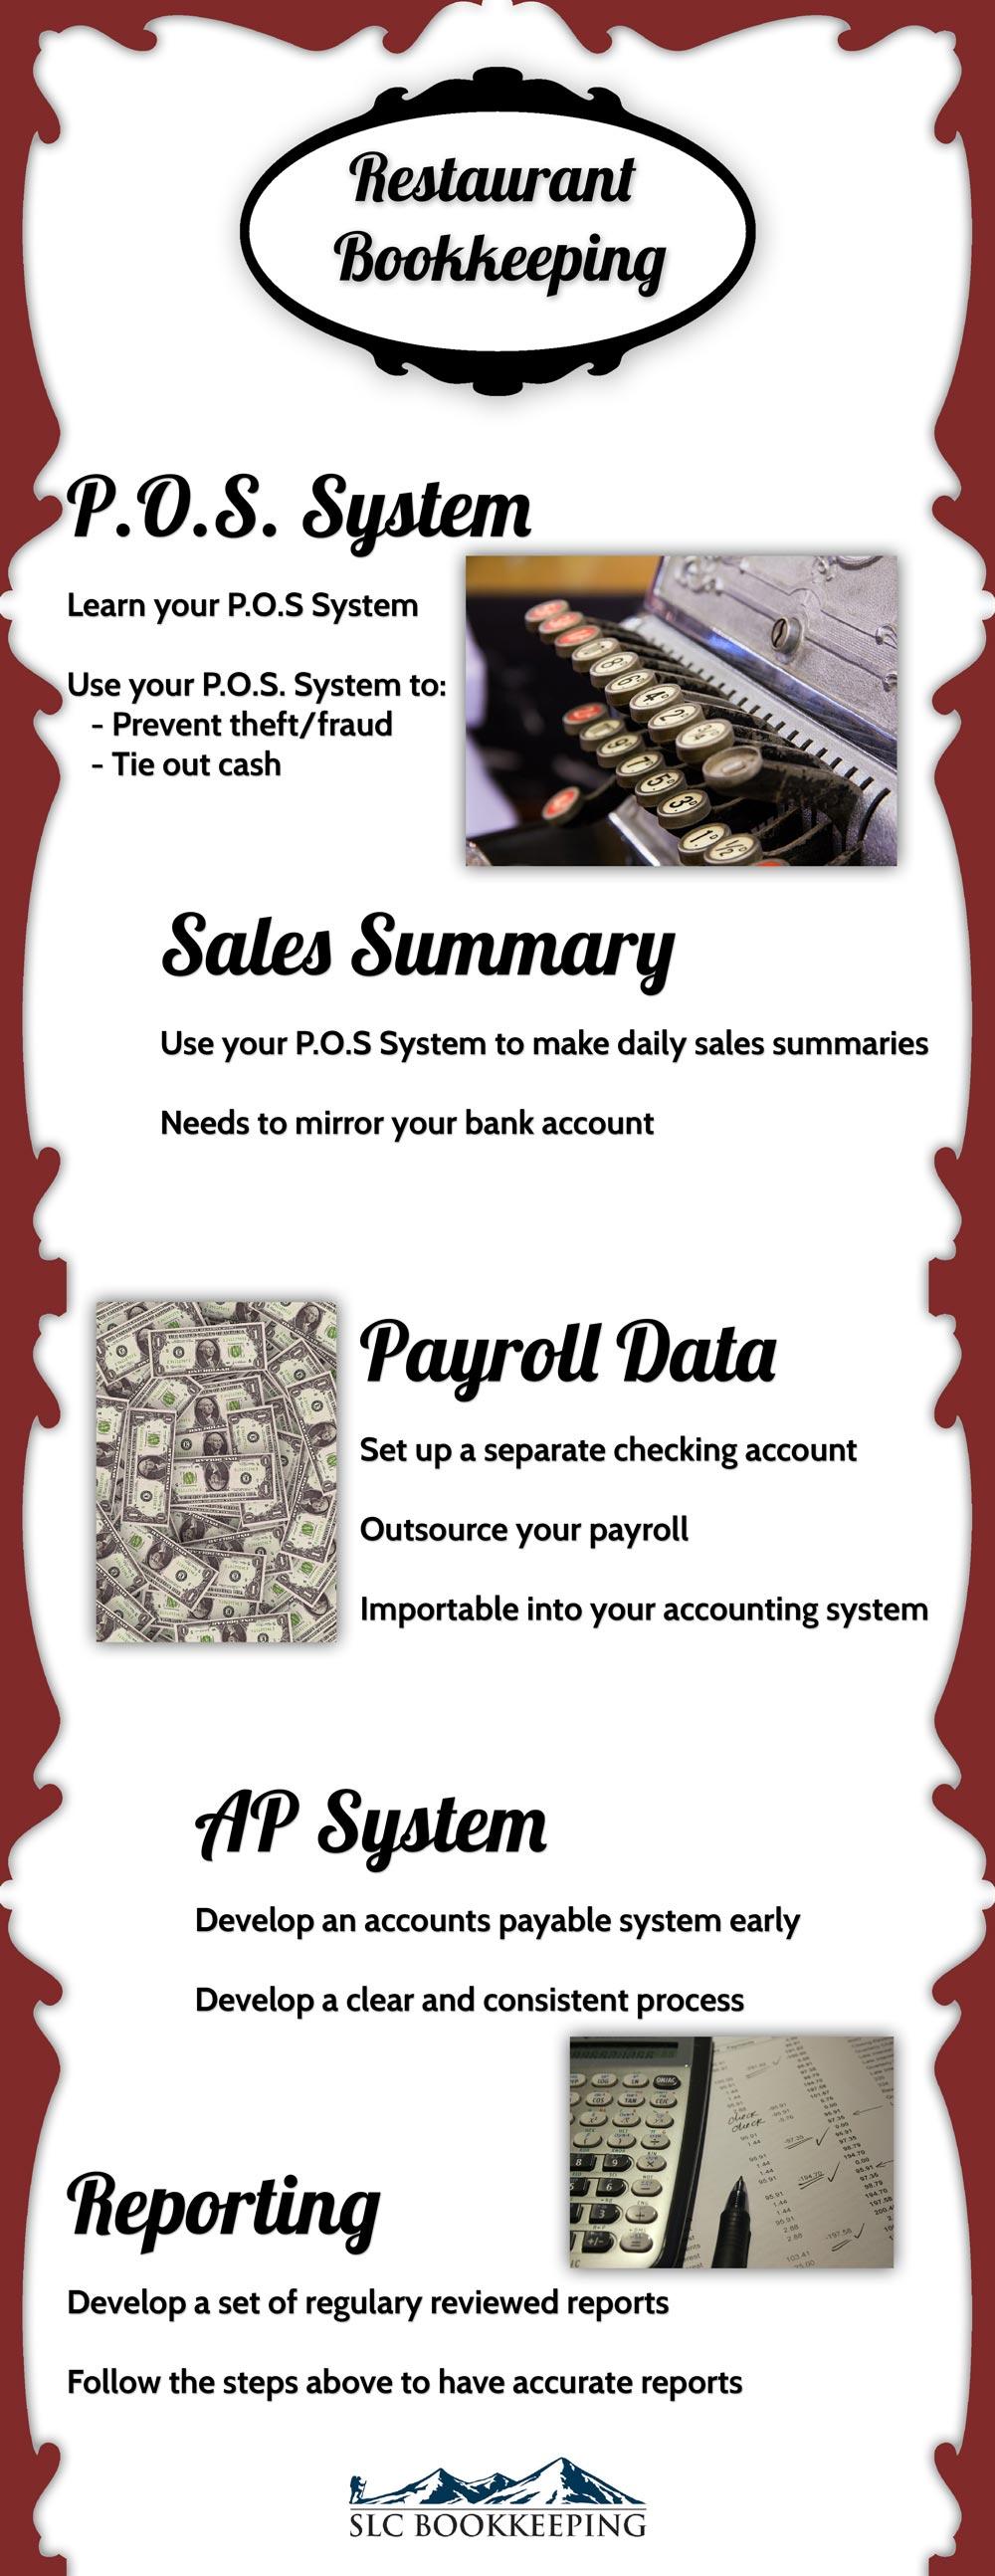 Restaurant-Bookkeeping.jpg